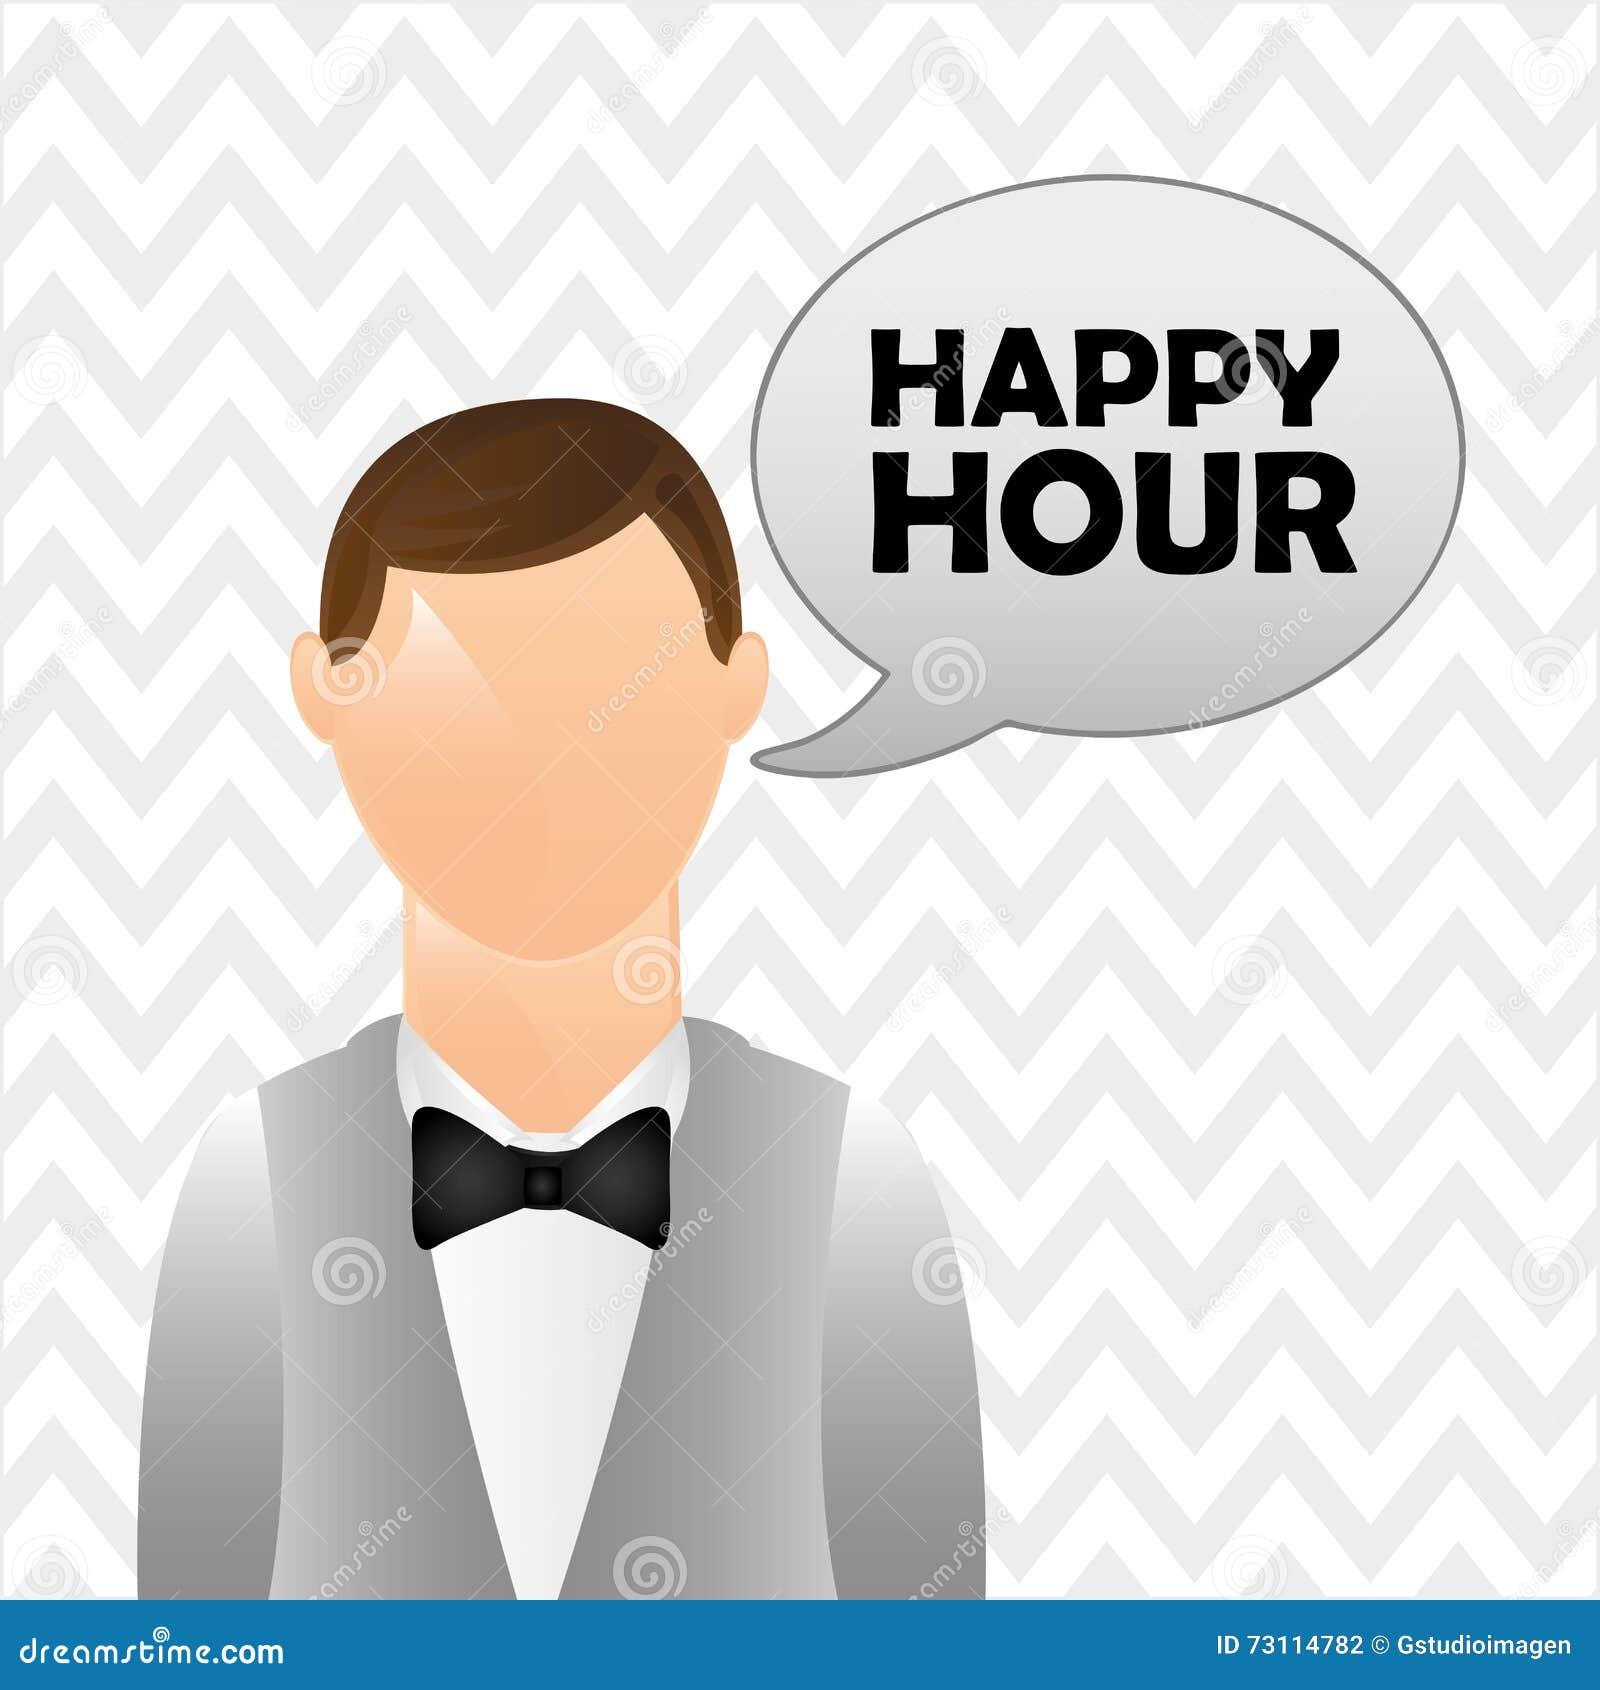 Happy Hour Design Royalty-Free Illustration